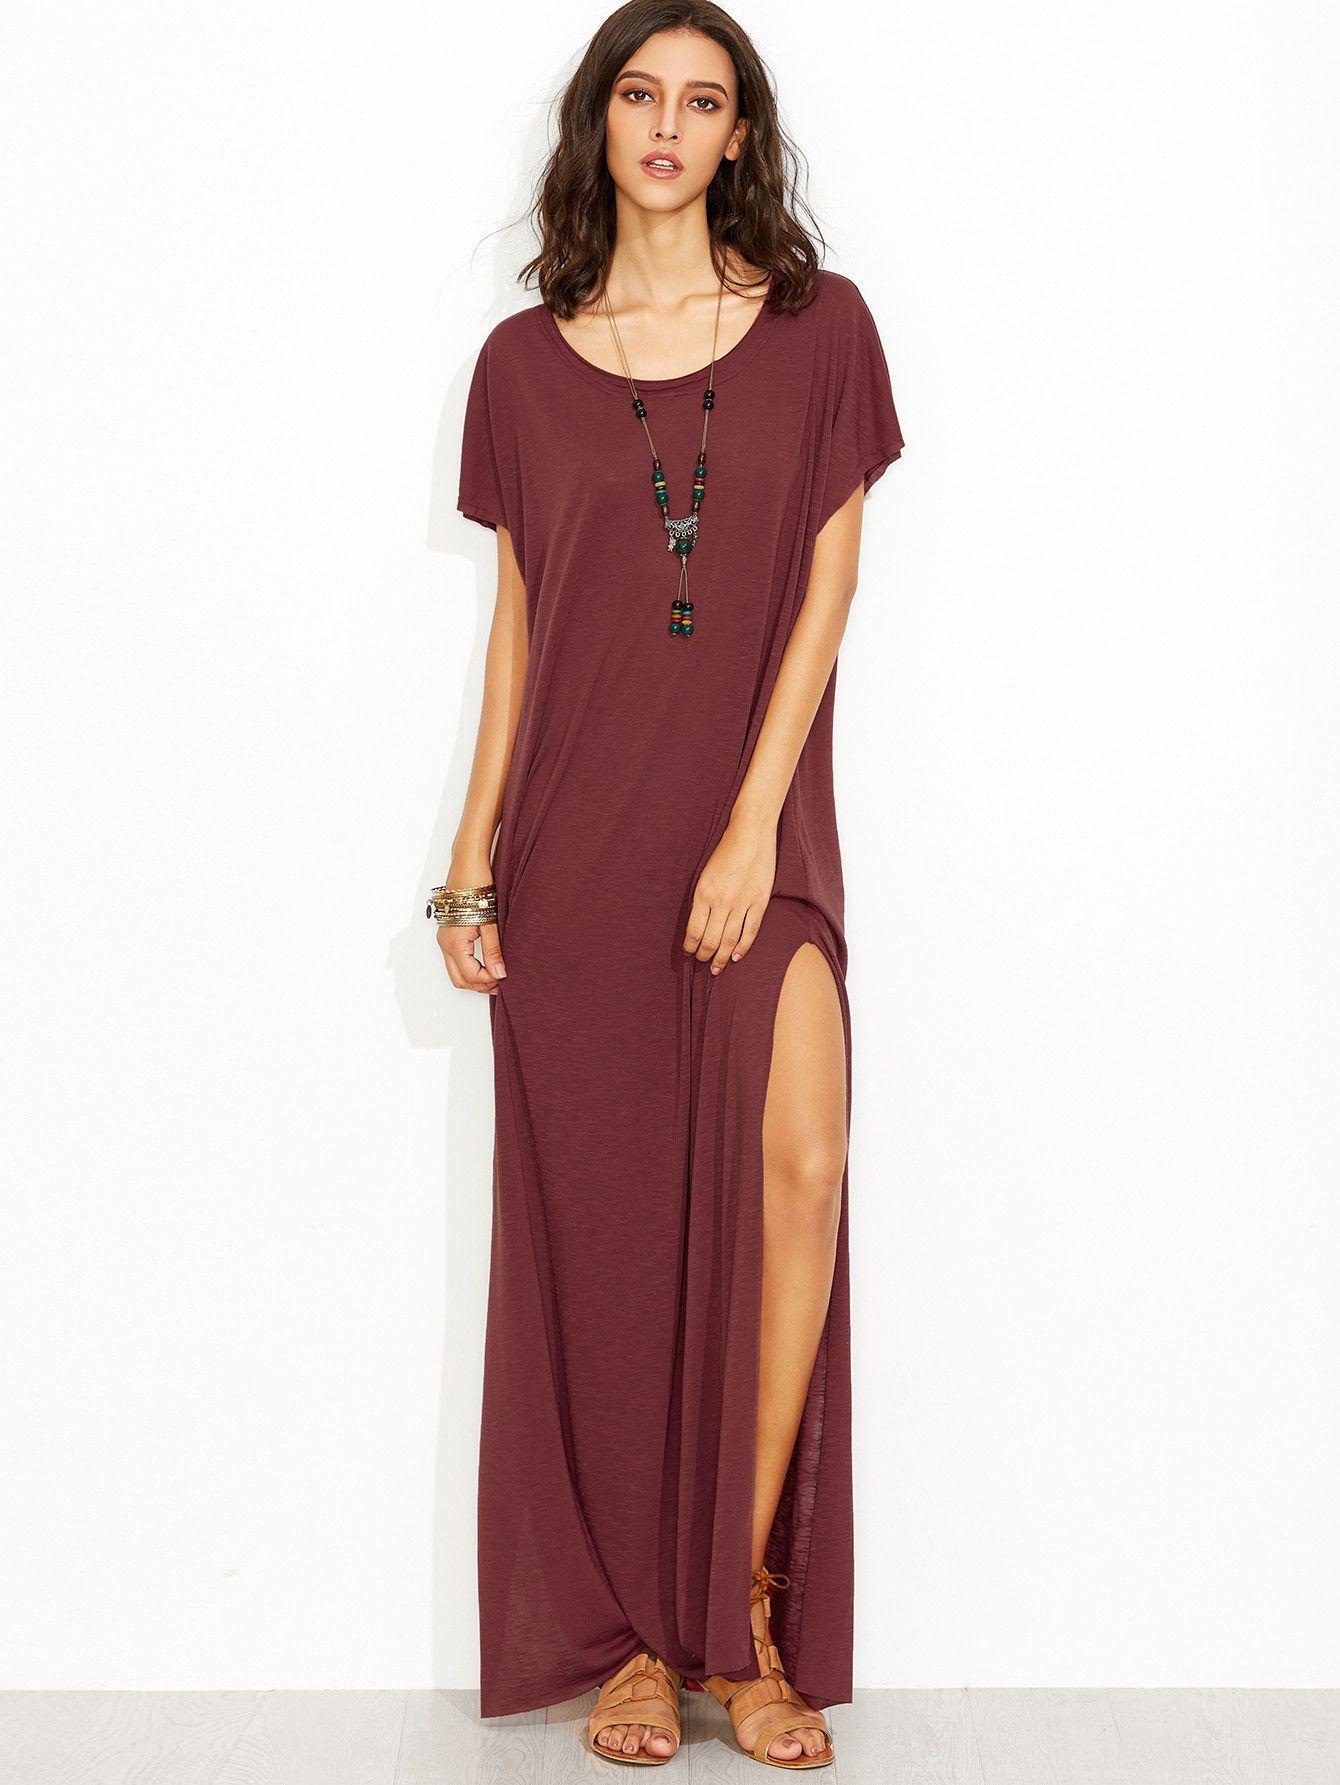 6249737866d5 ... L 52cm Fabric  Fabric has some stretch Season  Summer Type  Tshirt  Pattern Type  Plain Sleeve Length  Short Sleeve Color  Burgundy Dresses  Length  Maxi ...